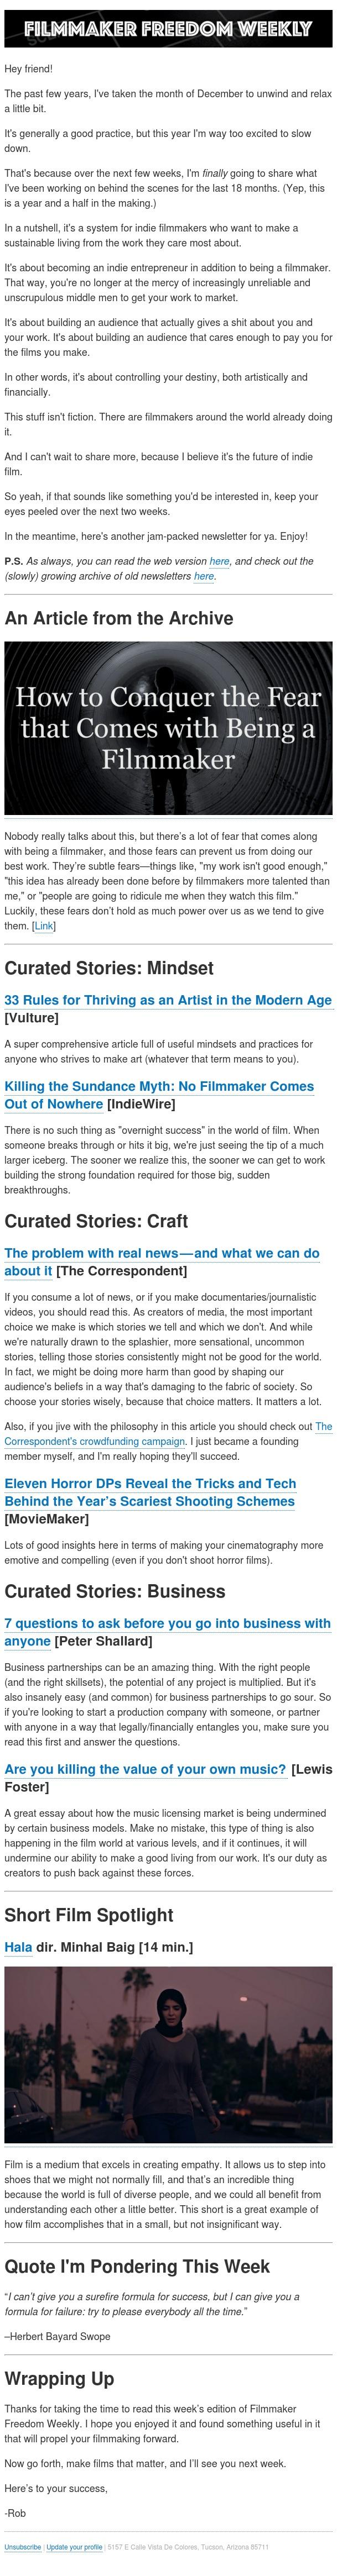 [Newsletter] Killing the Sundance Myth